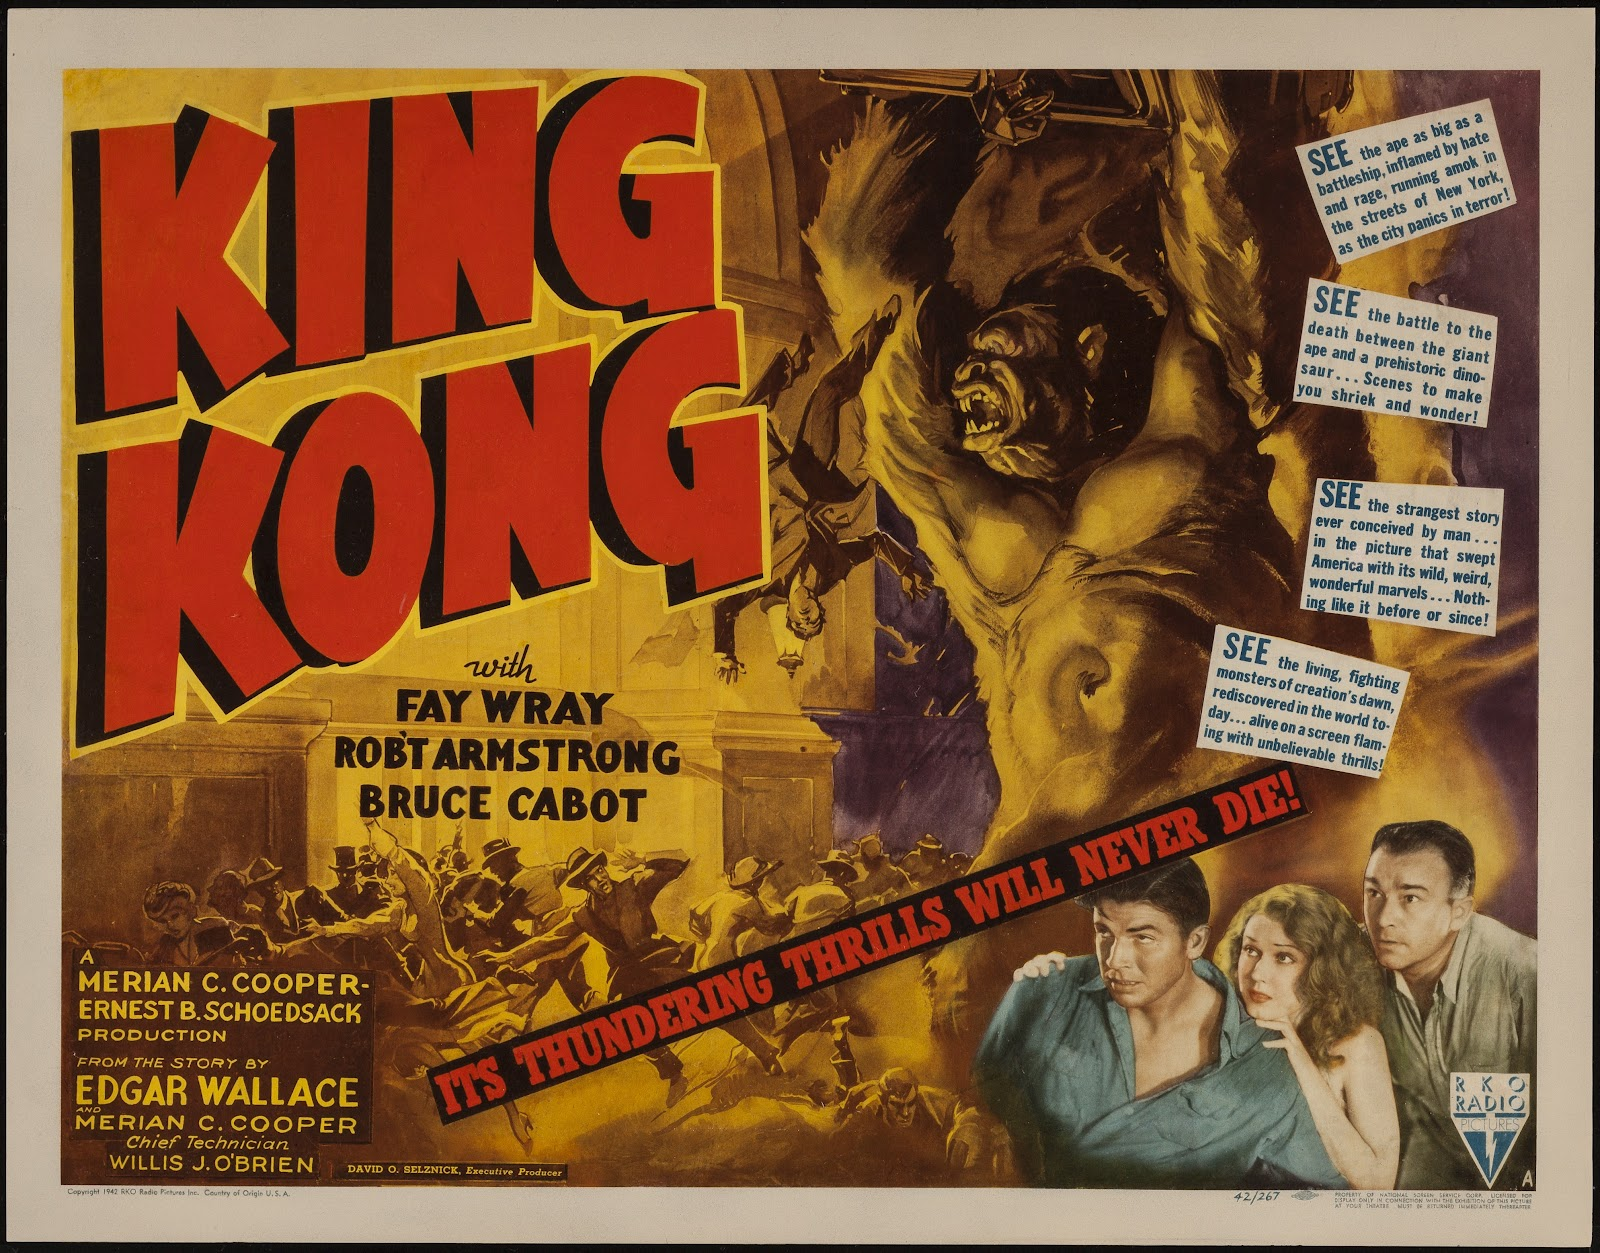 Original 1933 king kong movie poster value